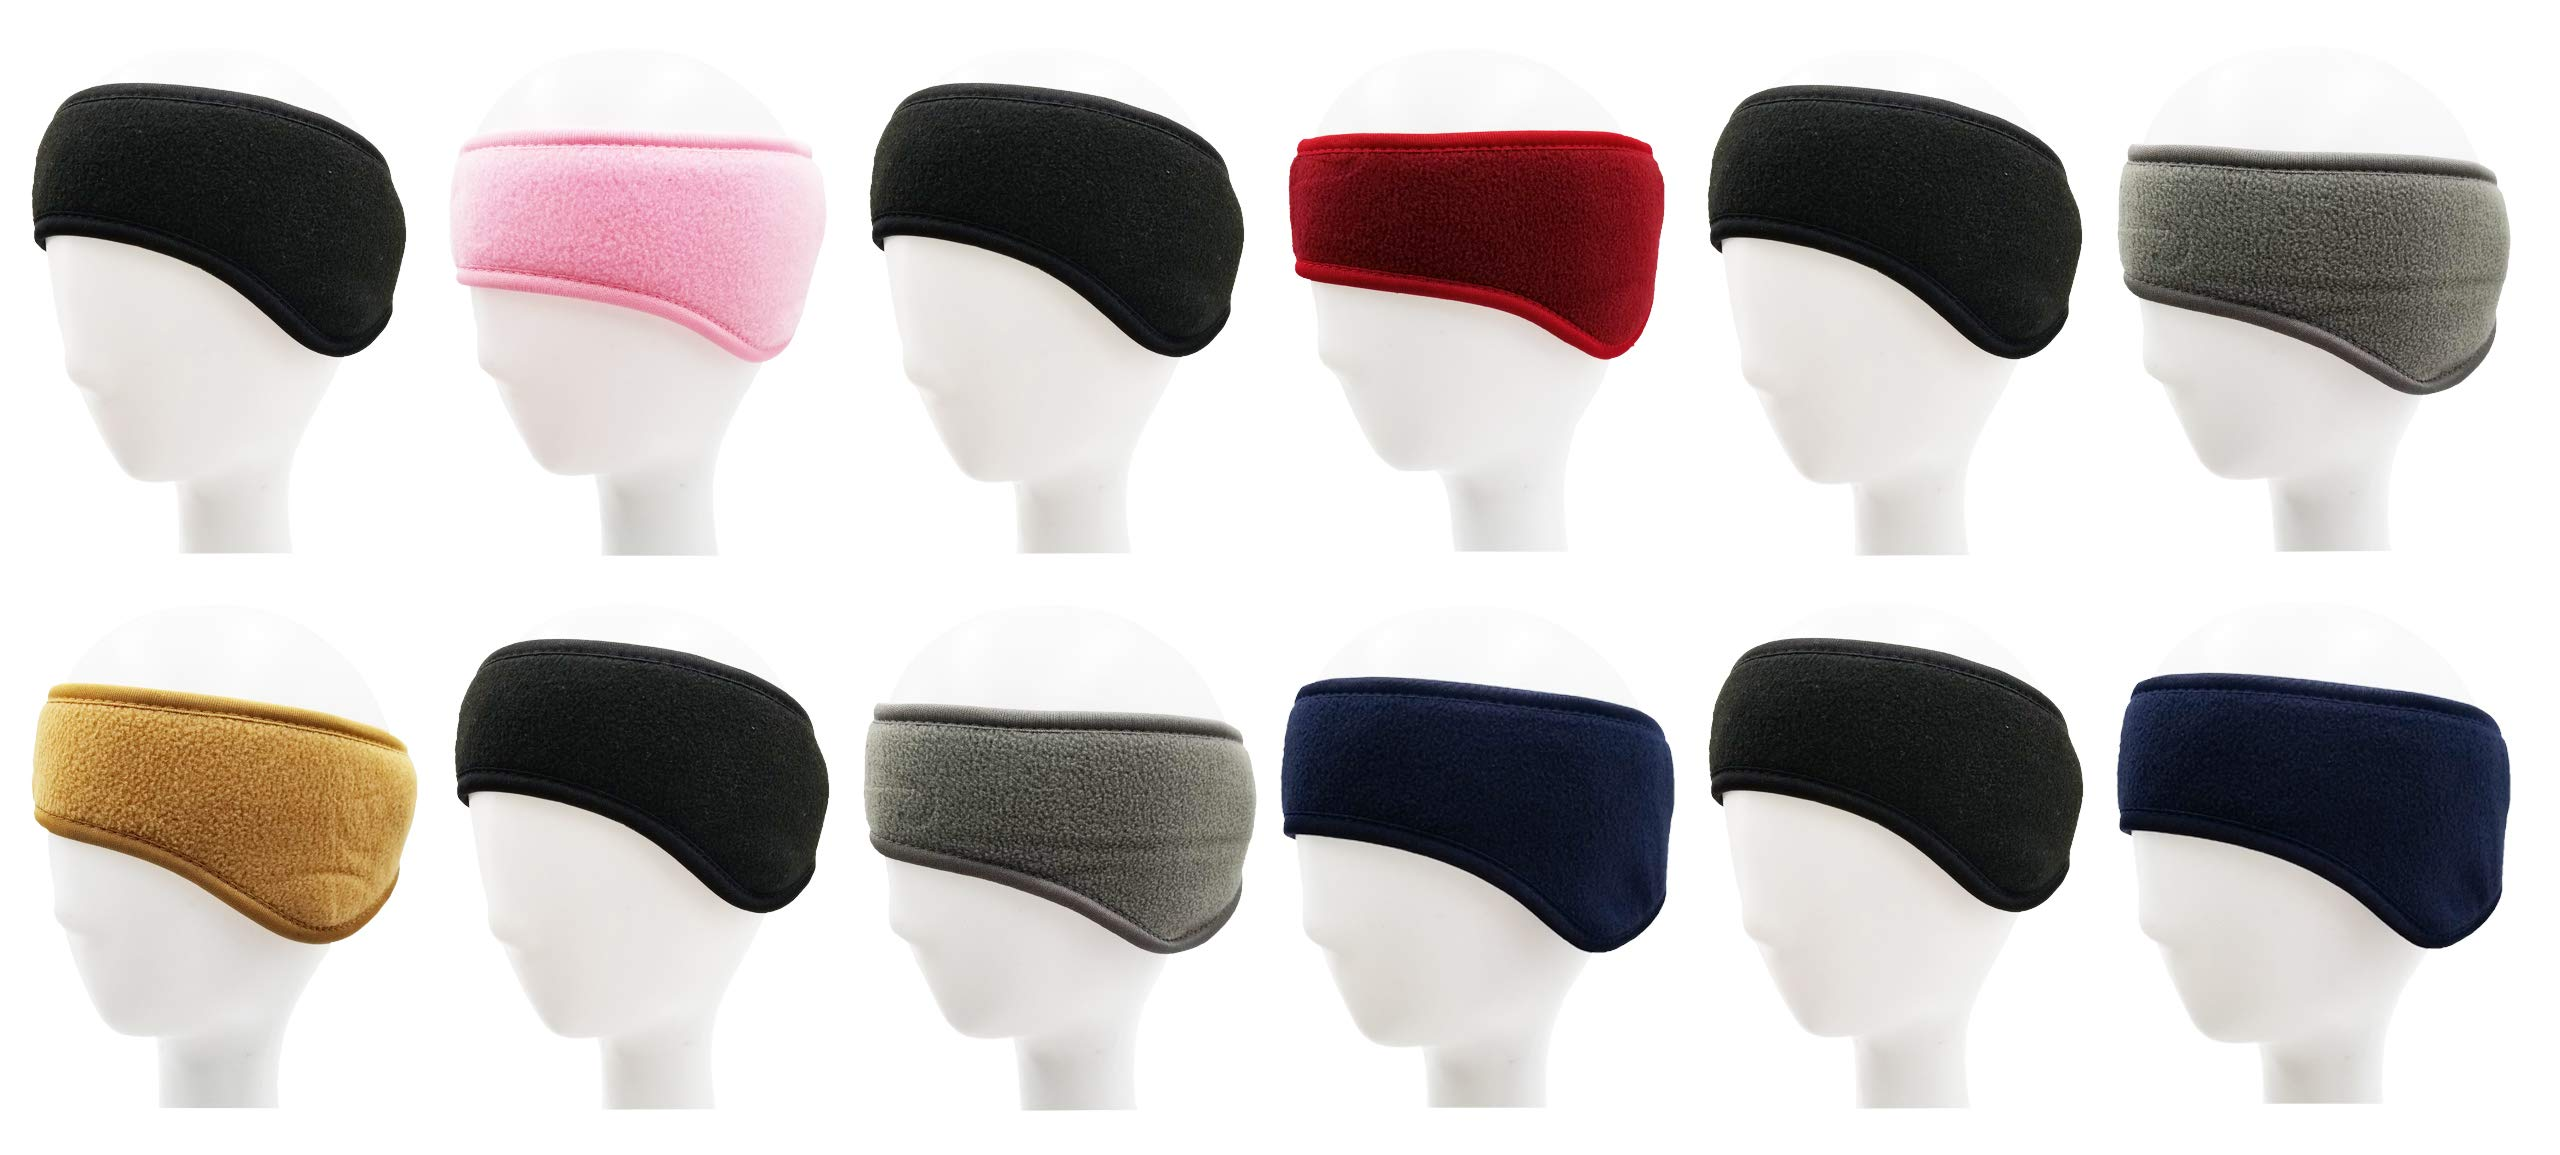 Winter Earmuffs, 12 Pack, Cozy Ear Warmers Colors Mens Womens Unisex Bulk Assorted Ear Muff (12 Pack - Assorted Ear Wrap)